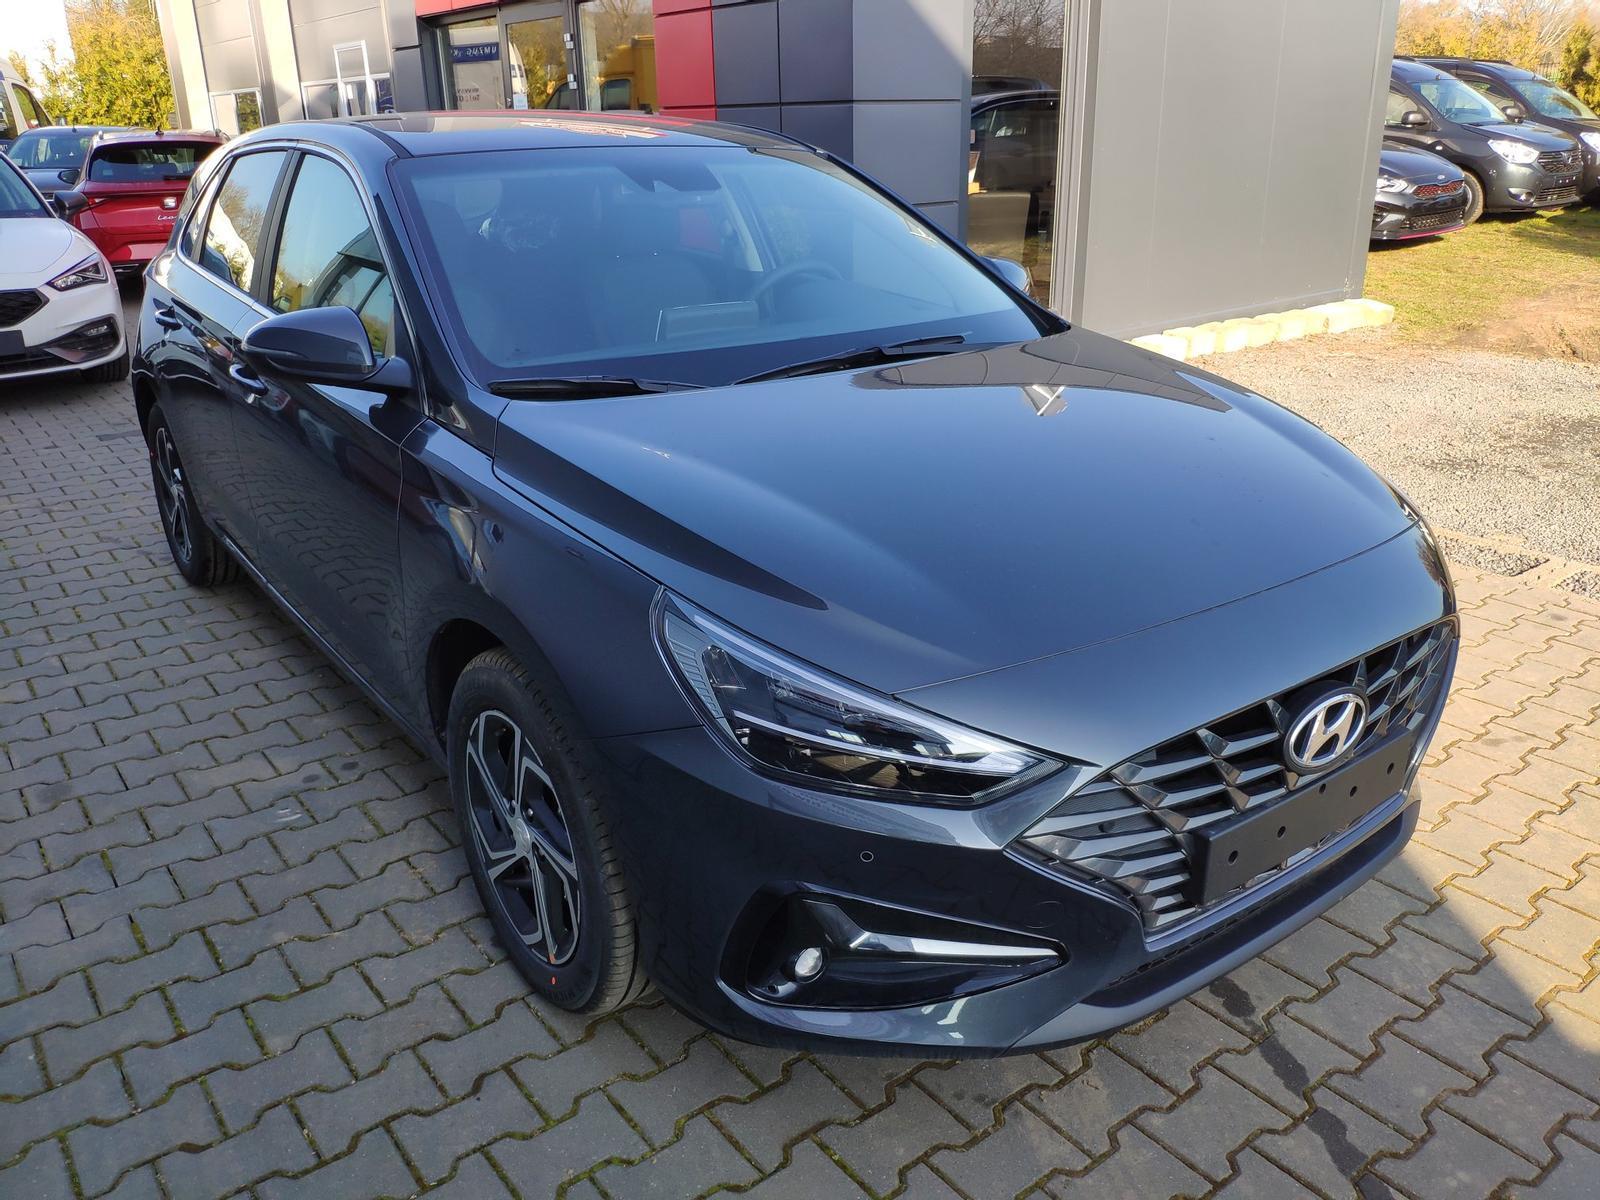 Hyundai i30 n. Modell! 120 PS Led*Shzg*App-Connect uvm!